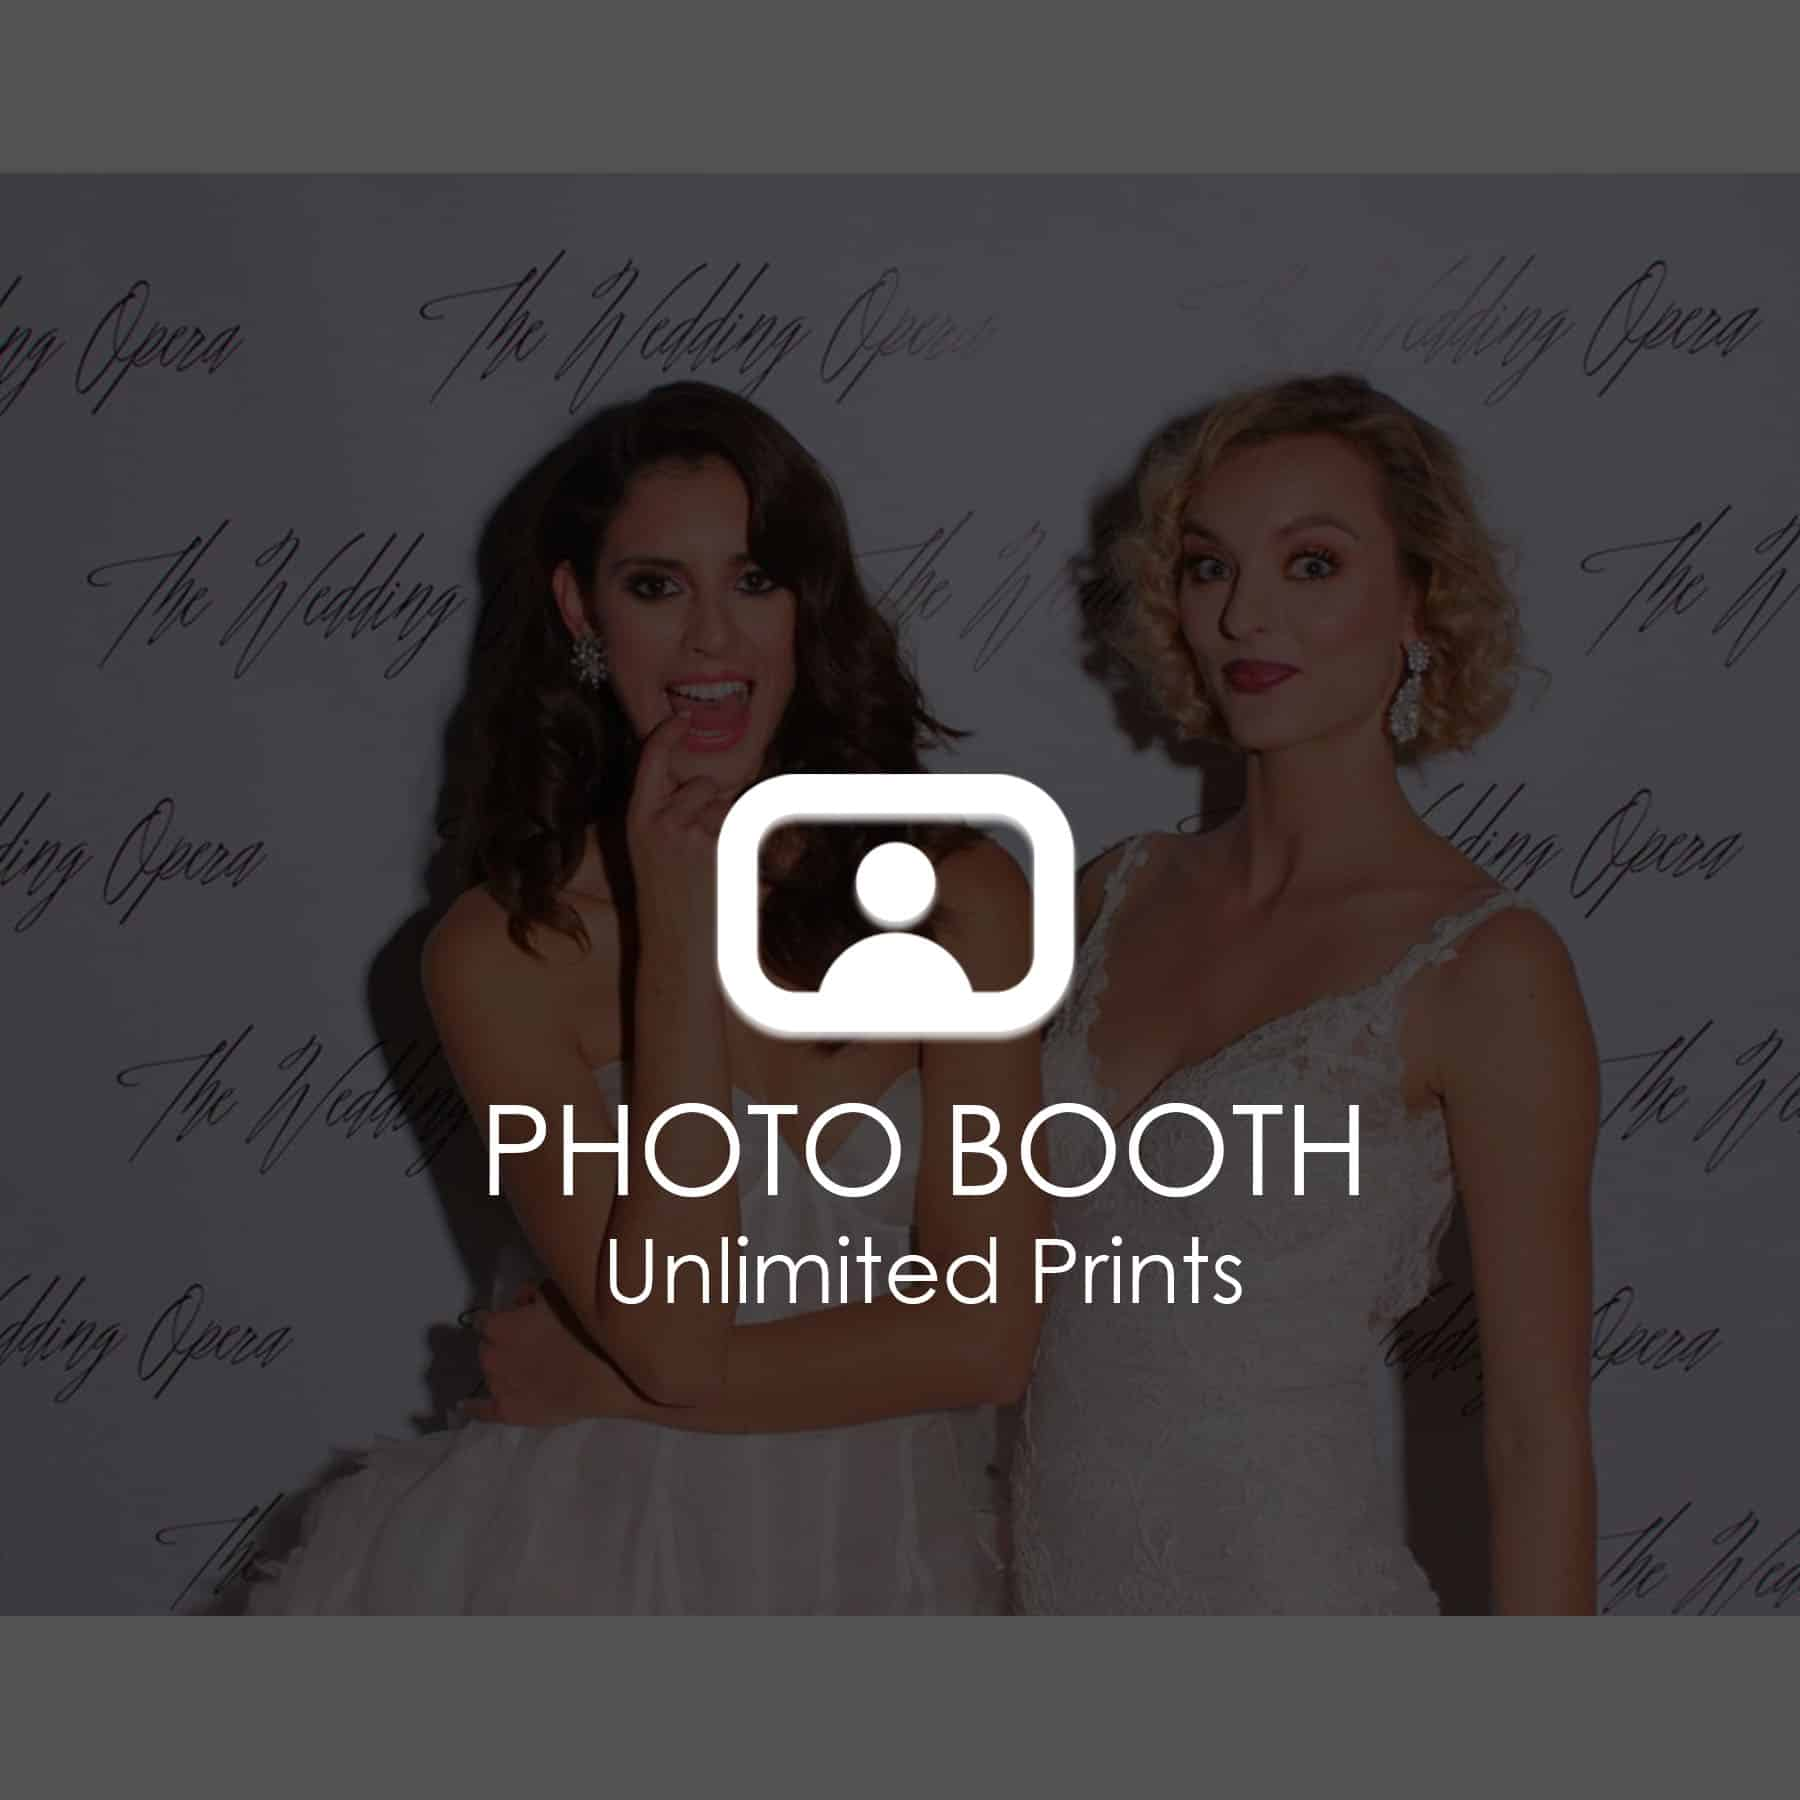 toronto photo booth